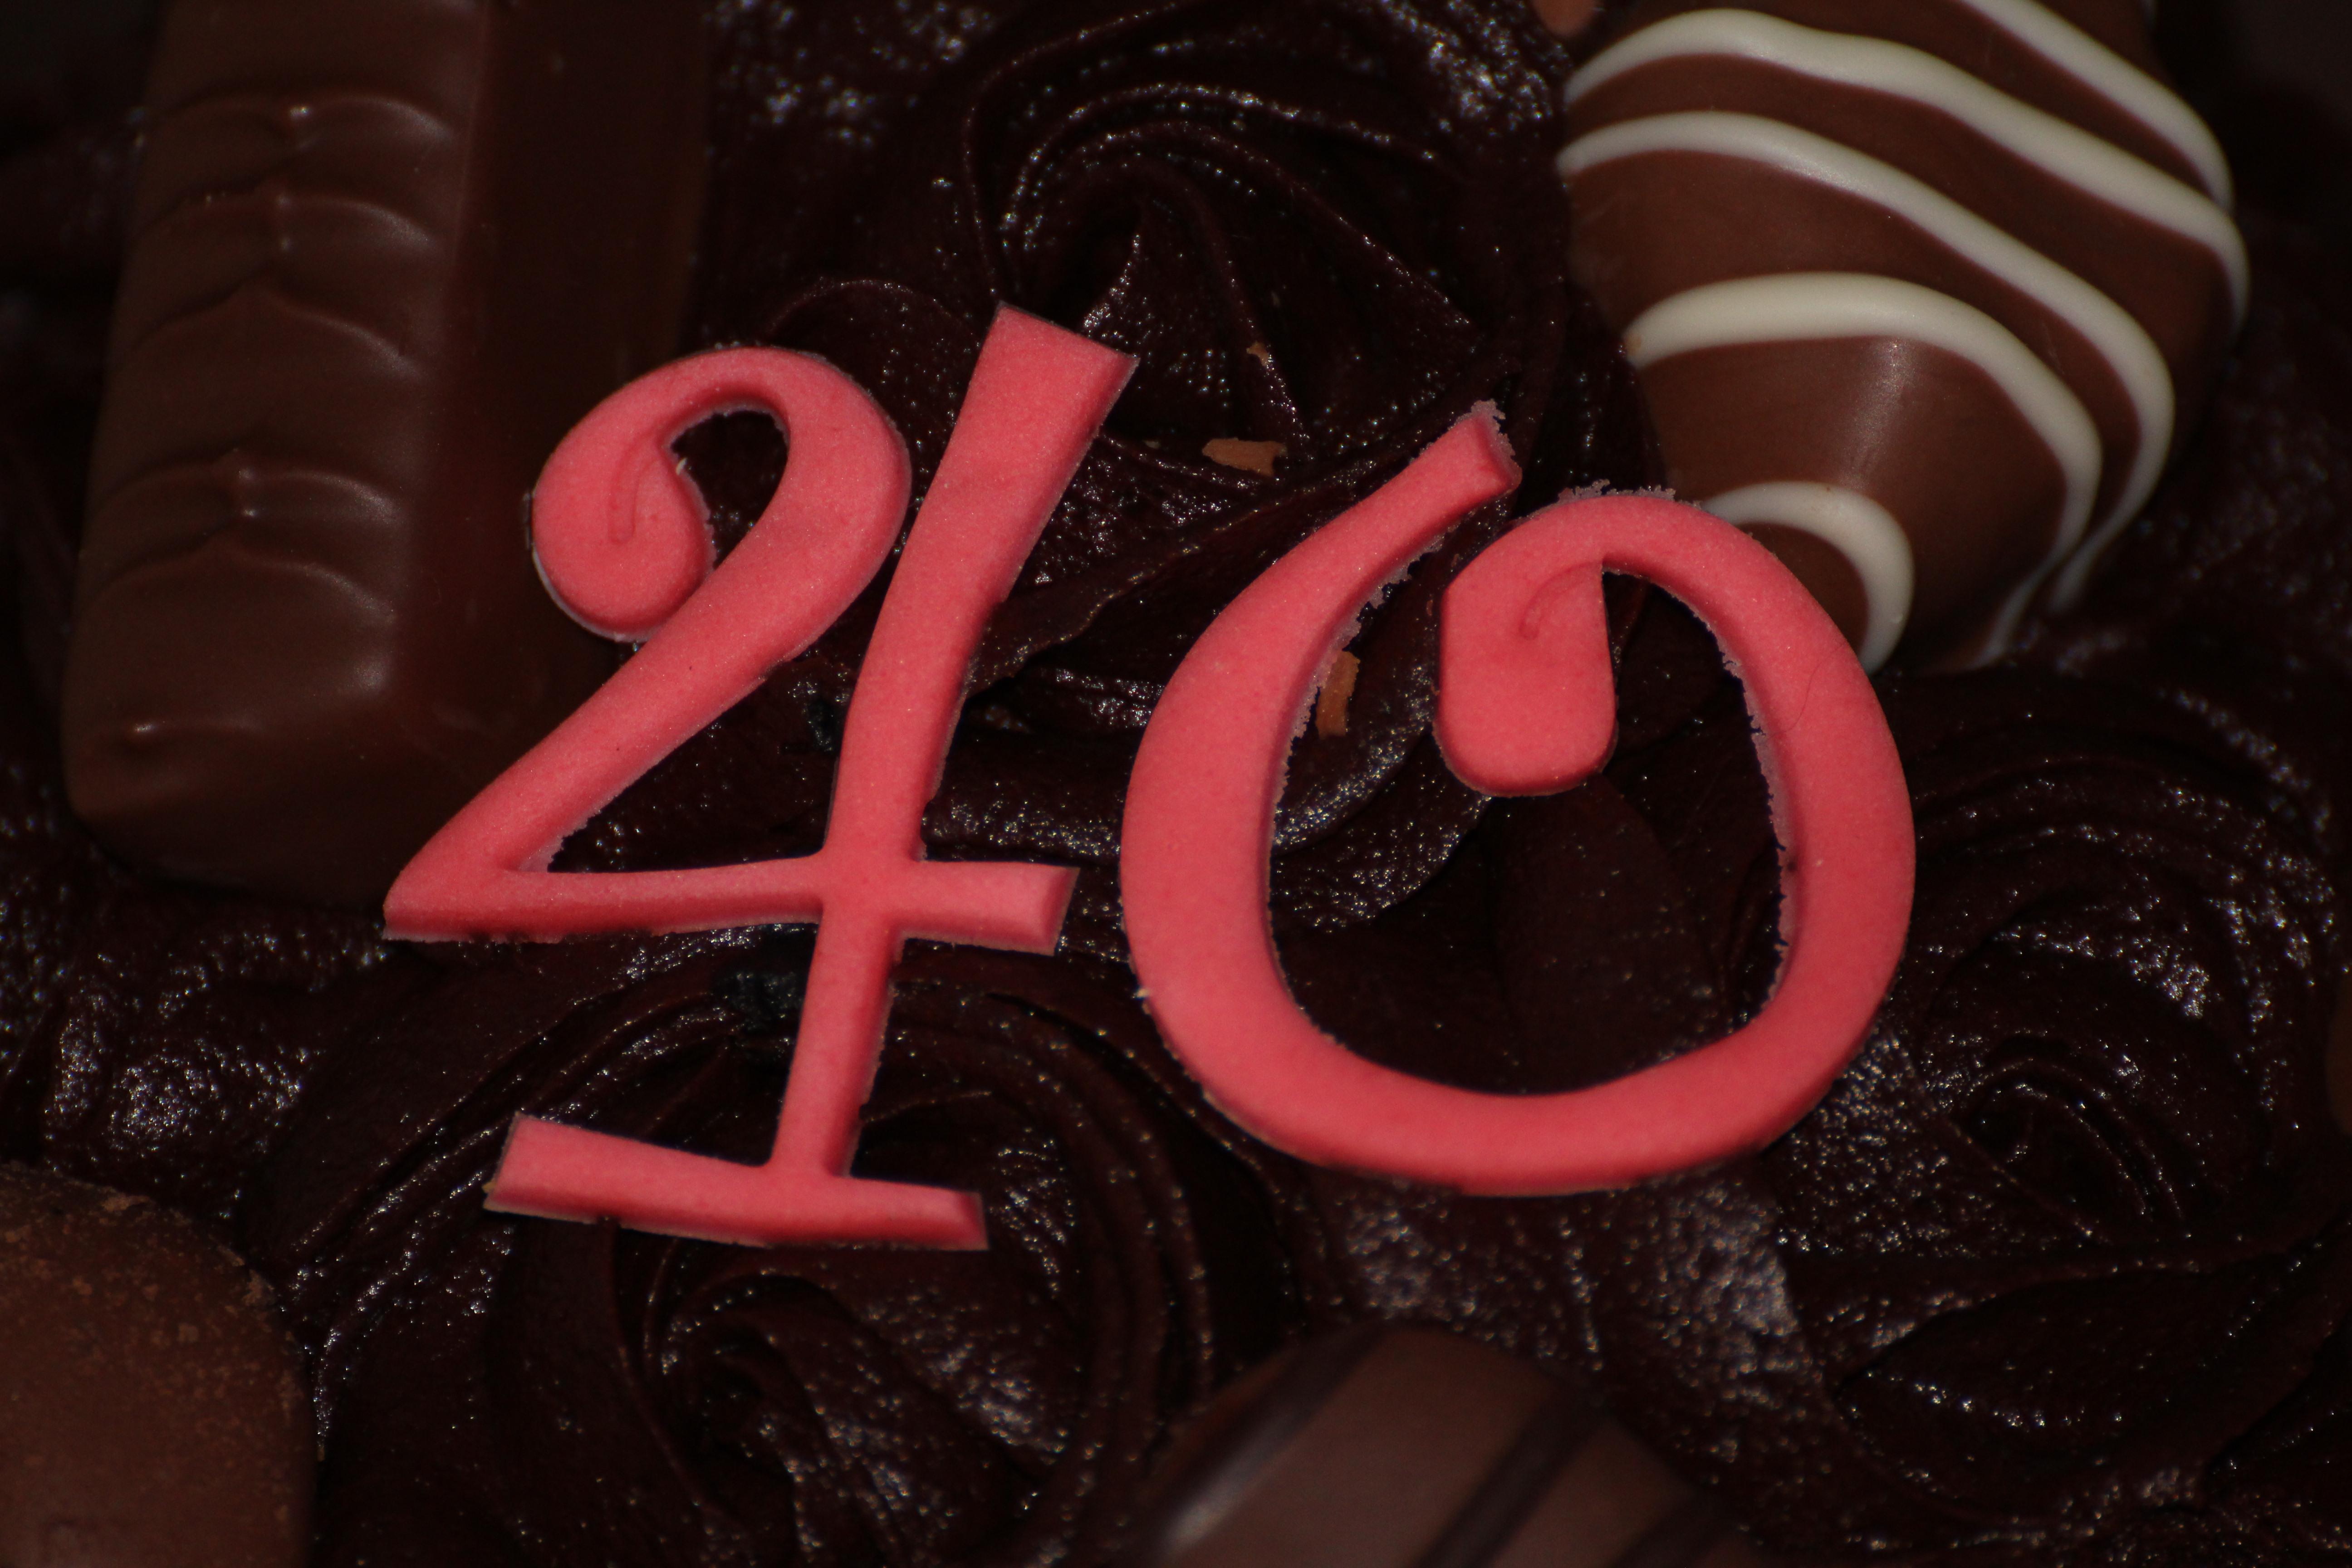 Lynn's 40th